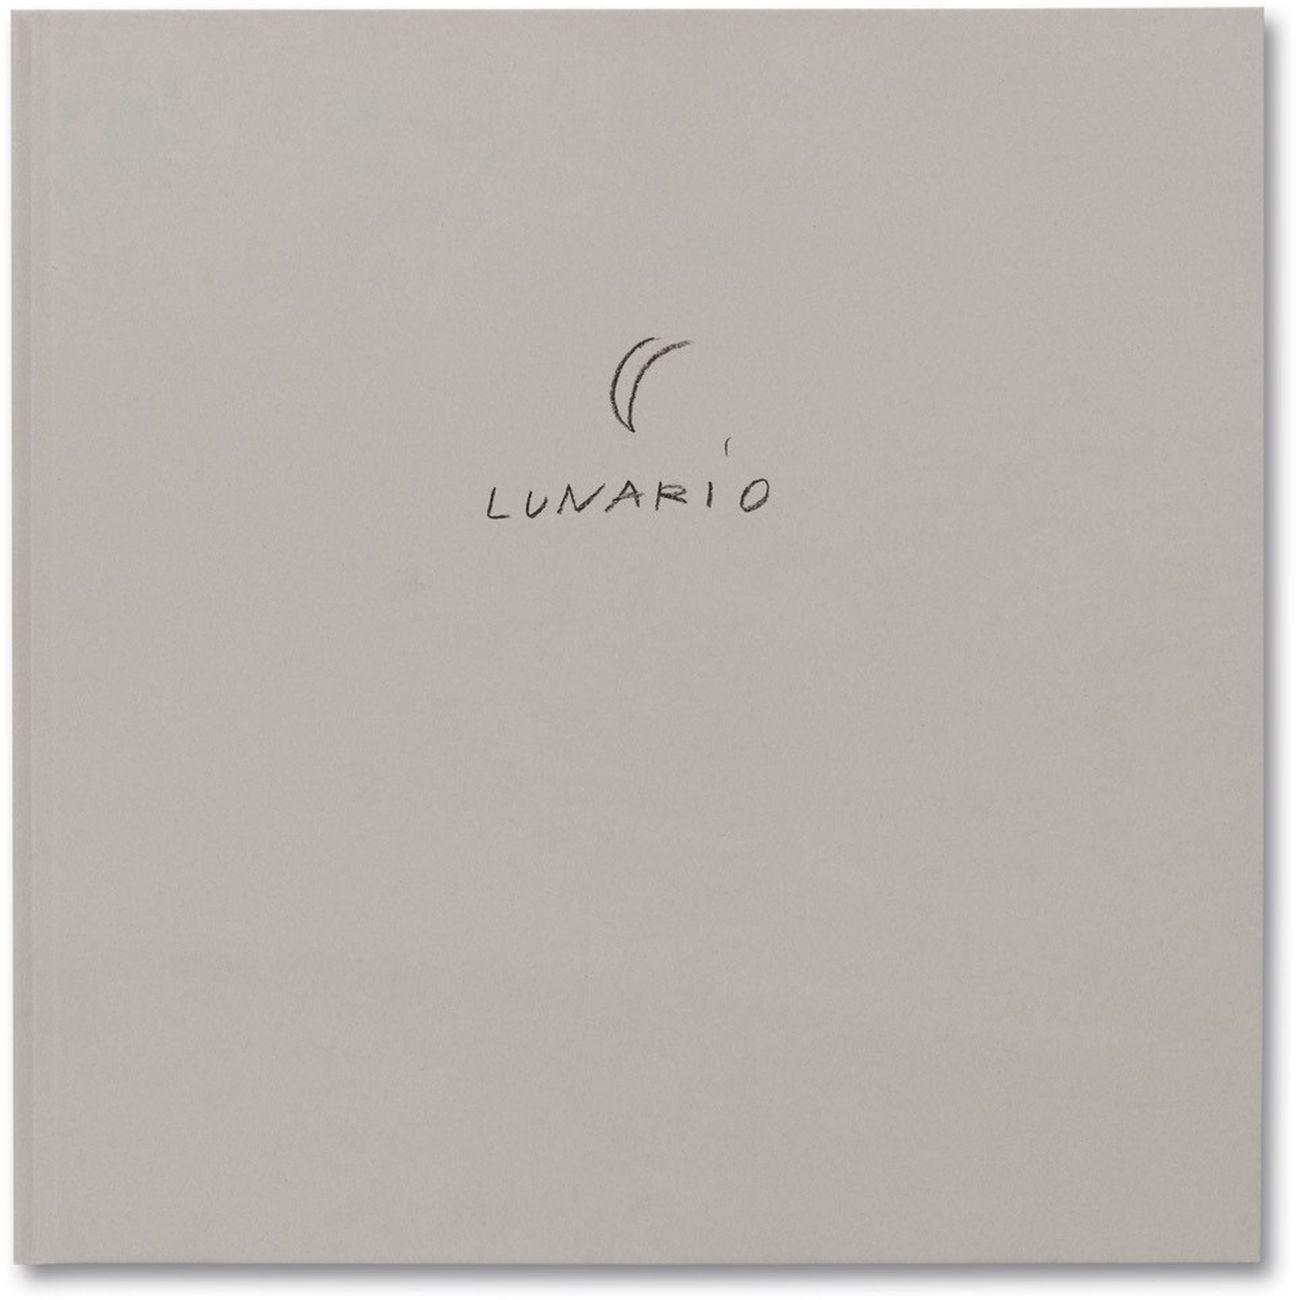 Guido Guidi – Lunario, 1968 1999 (MACK, Londra 2020)